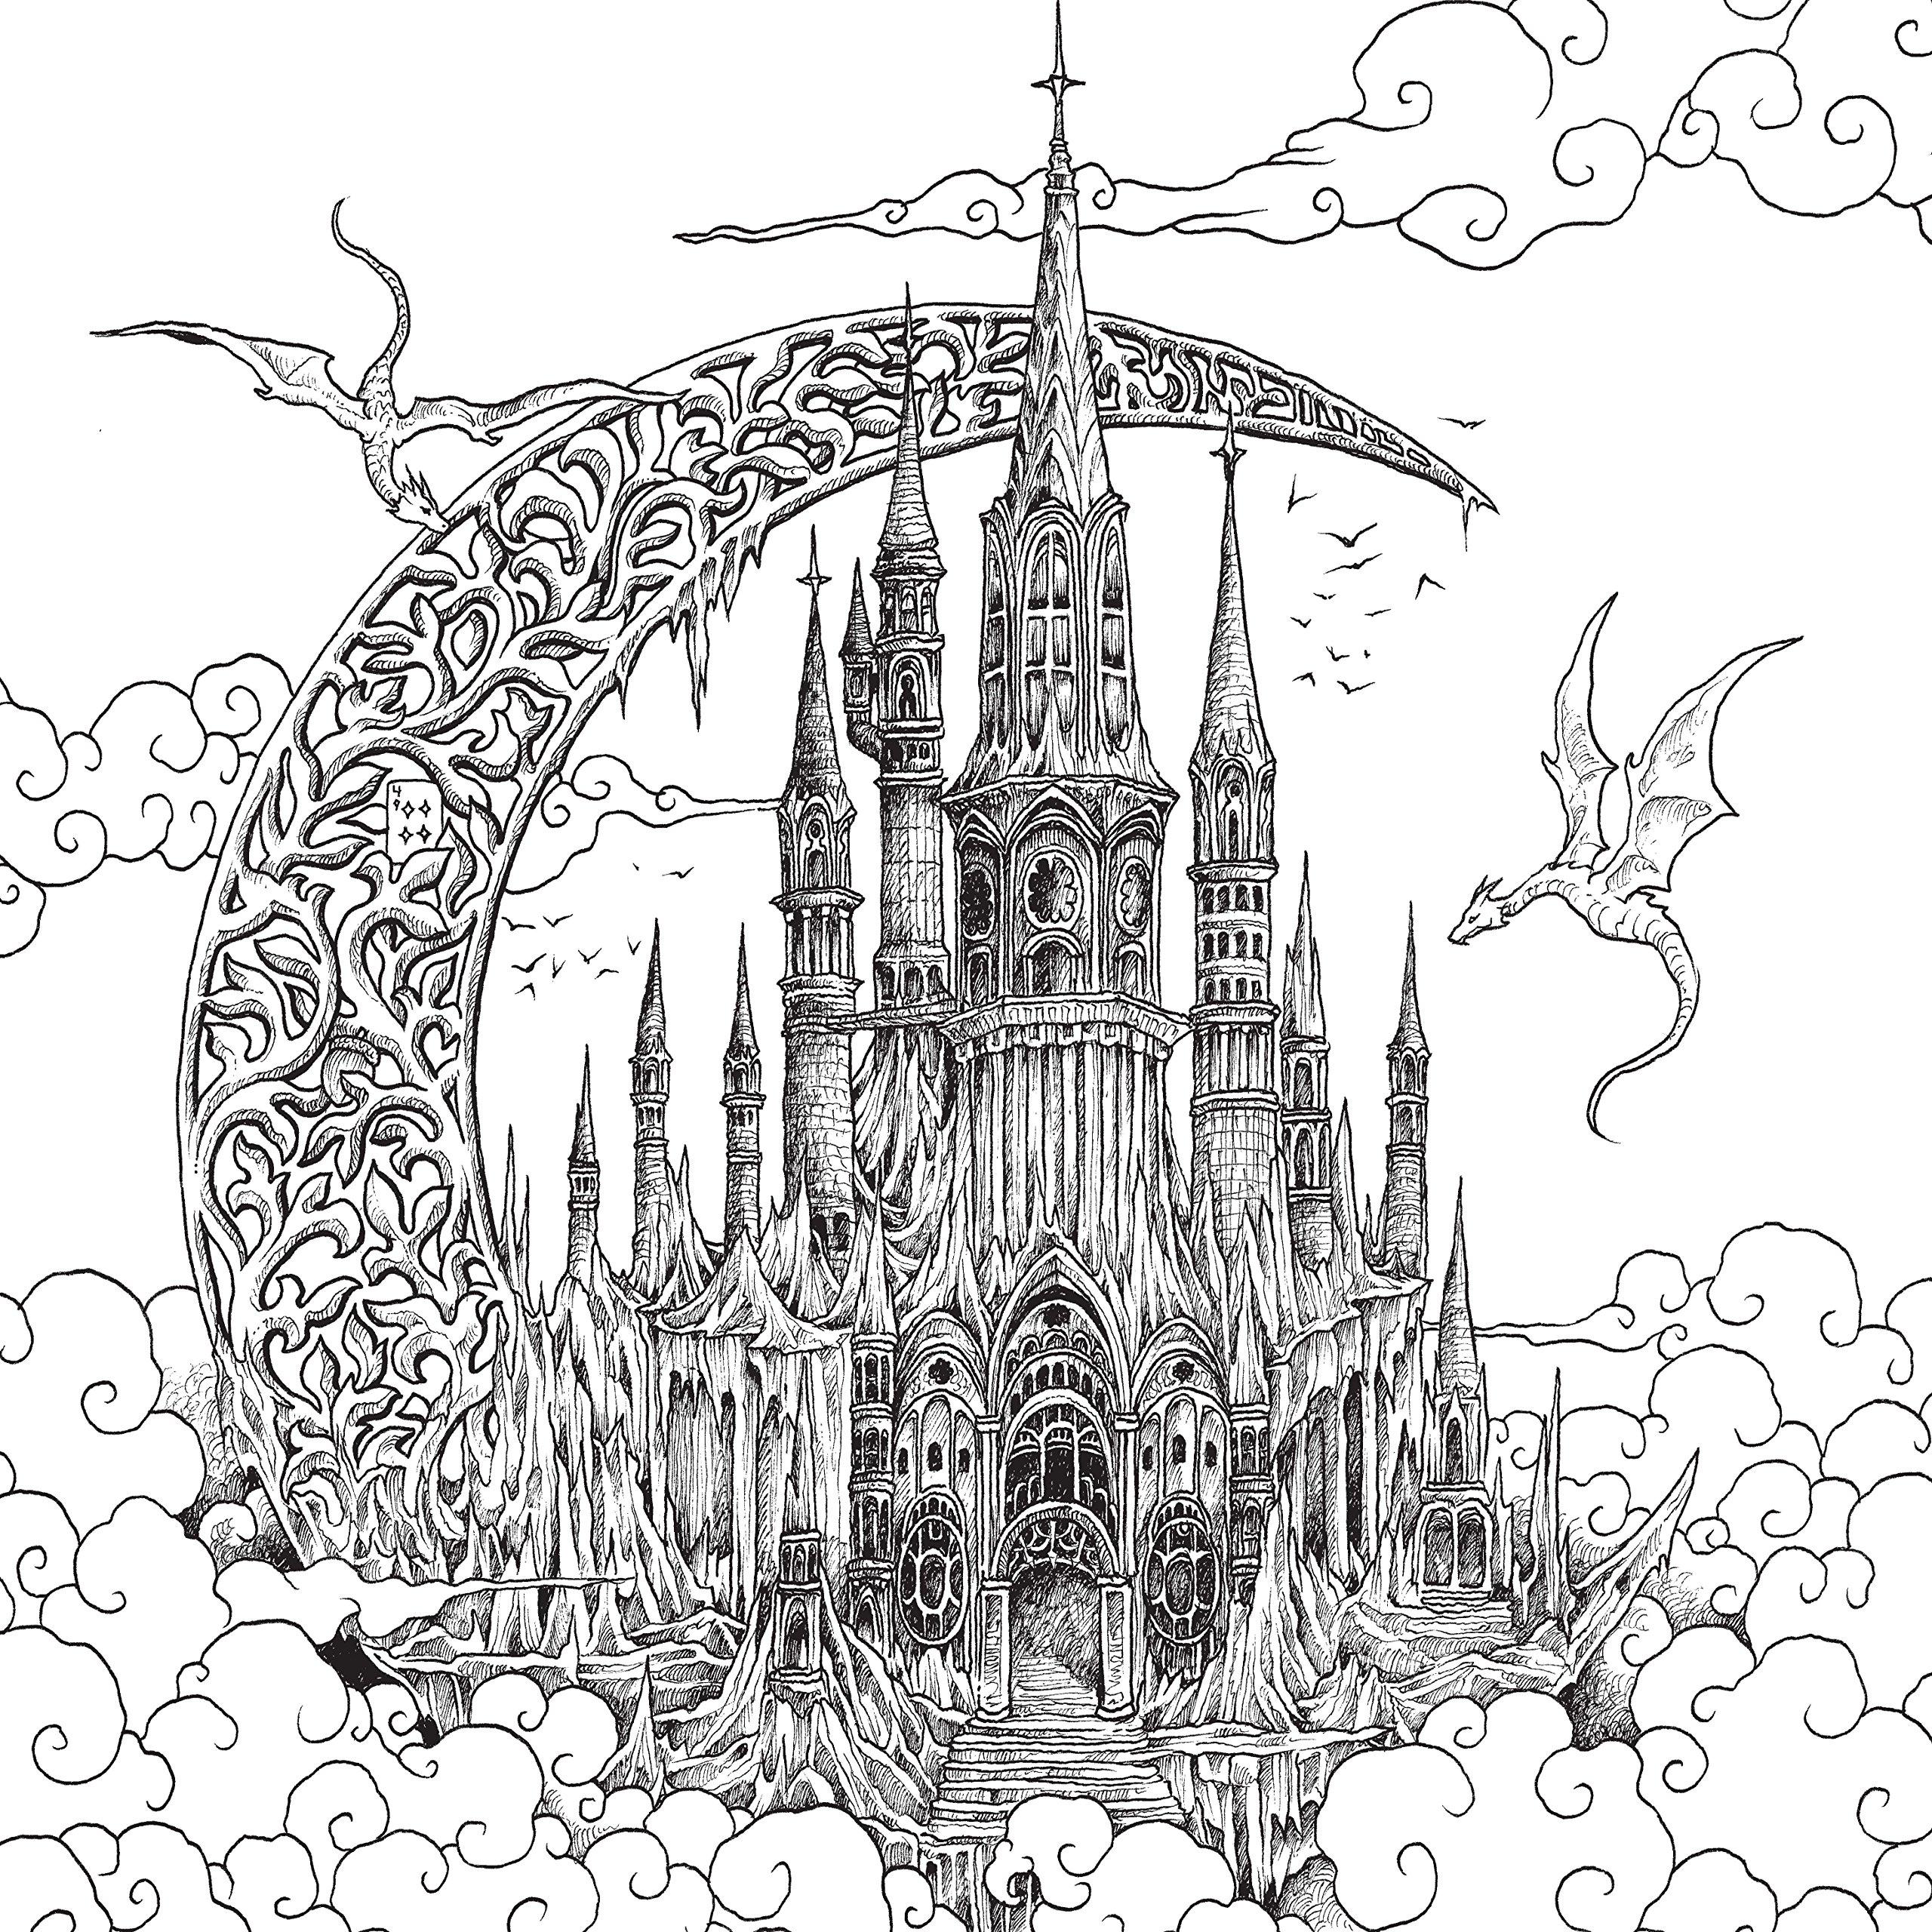 Драконы летают над замком